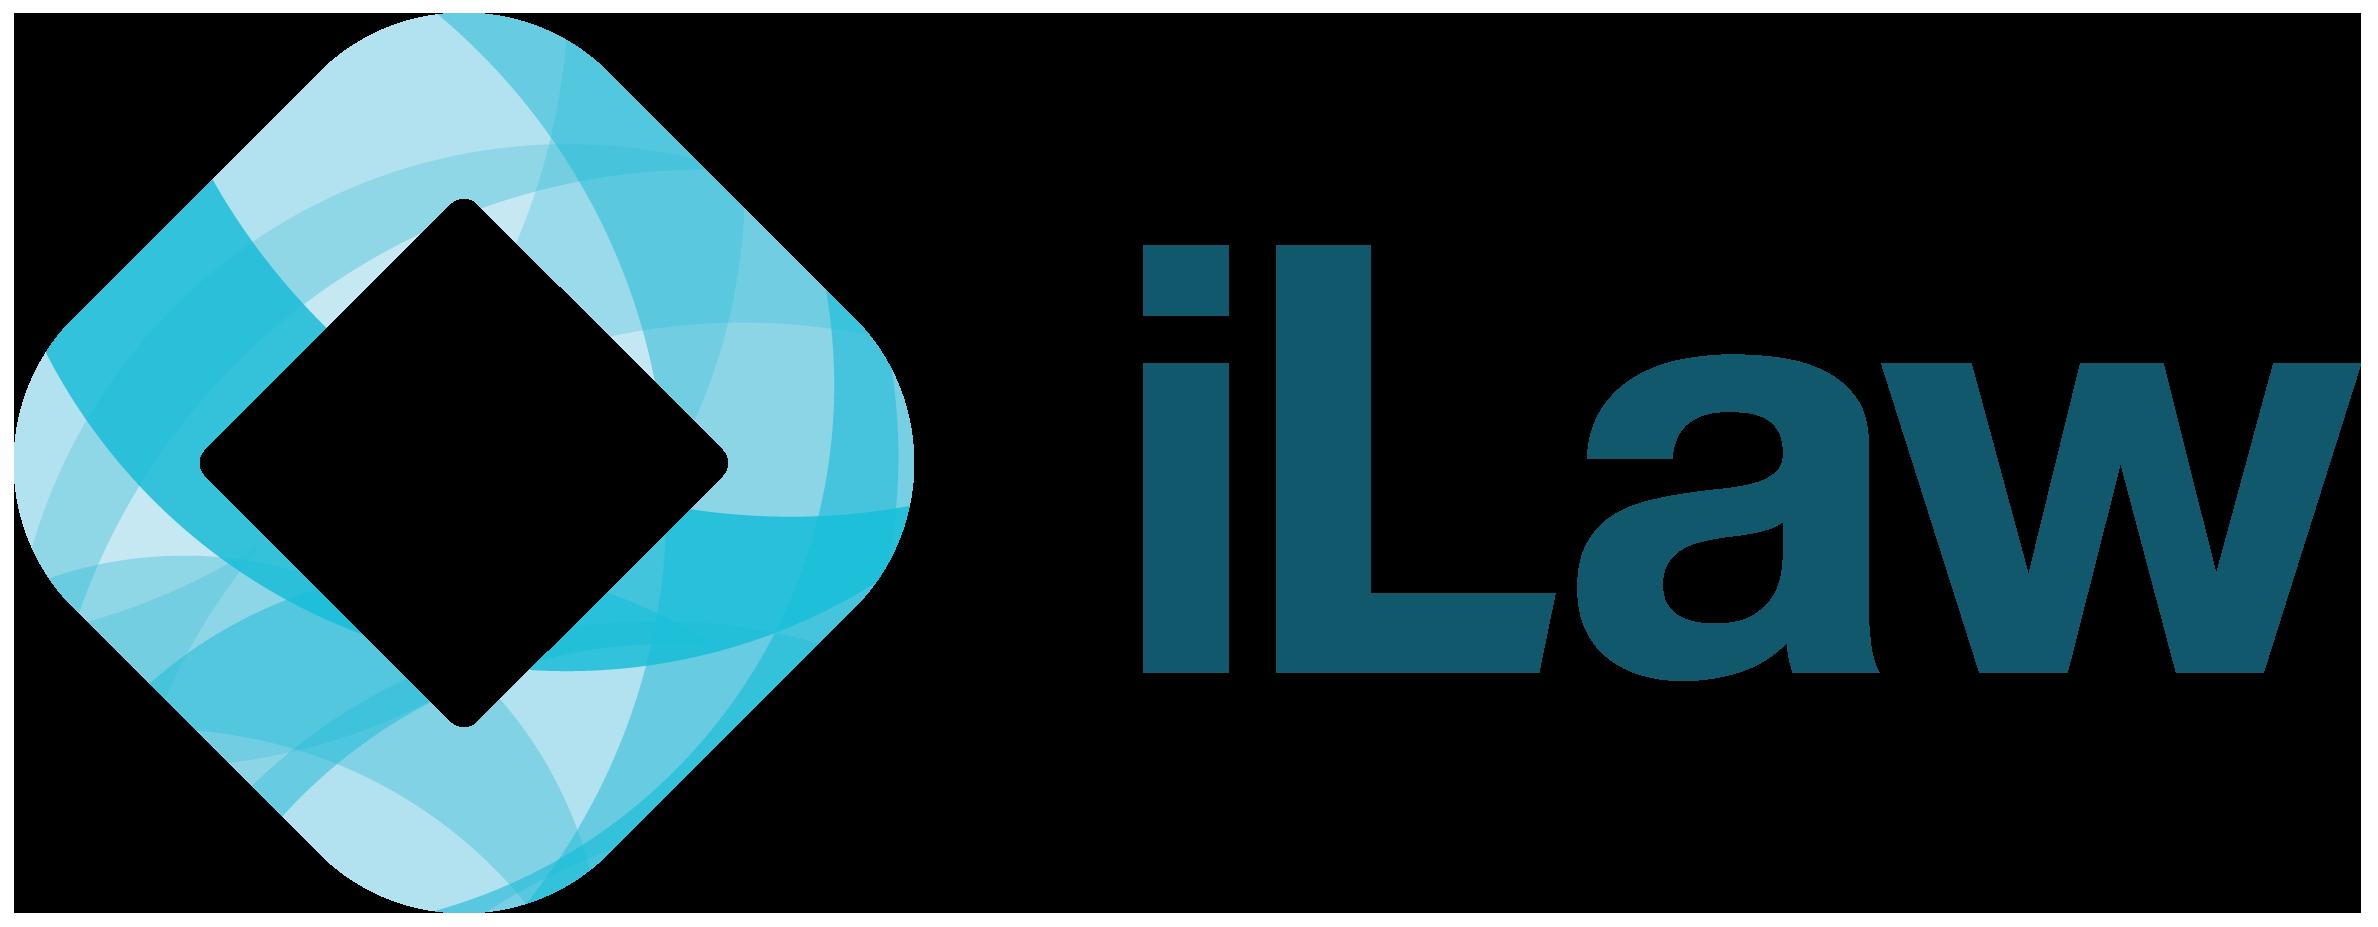 ILaw Logo blue text, transparent background